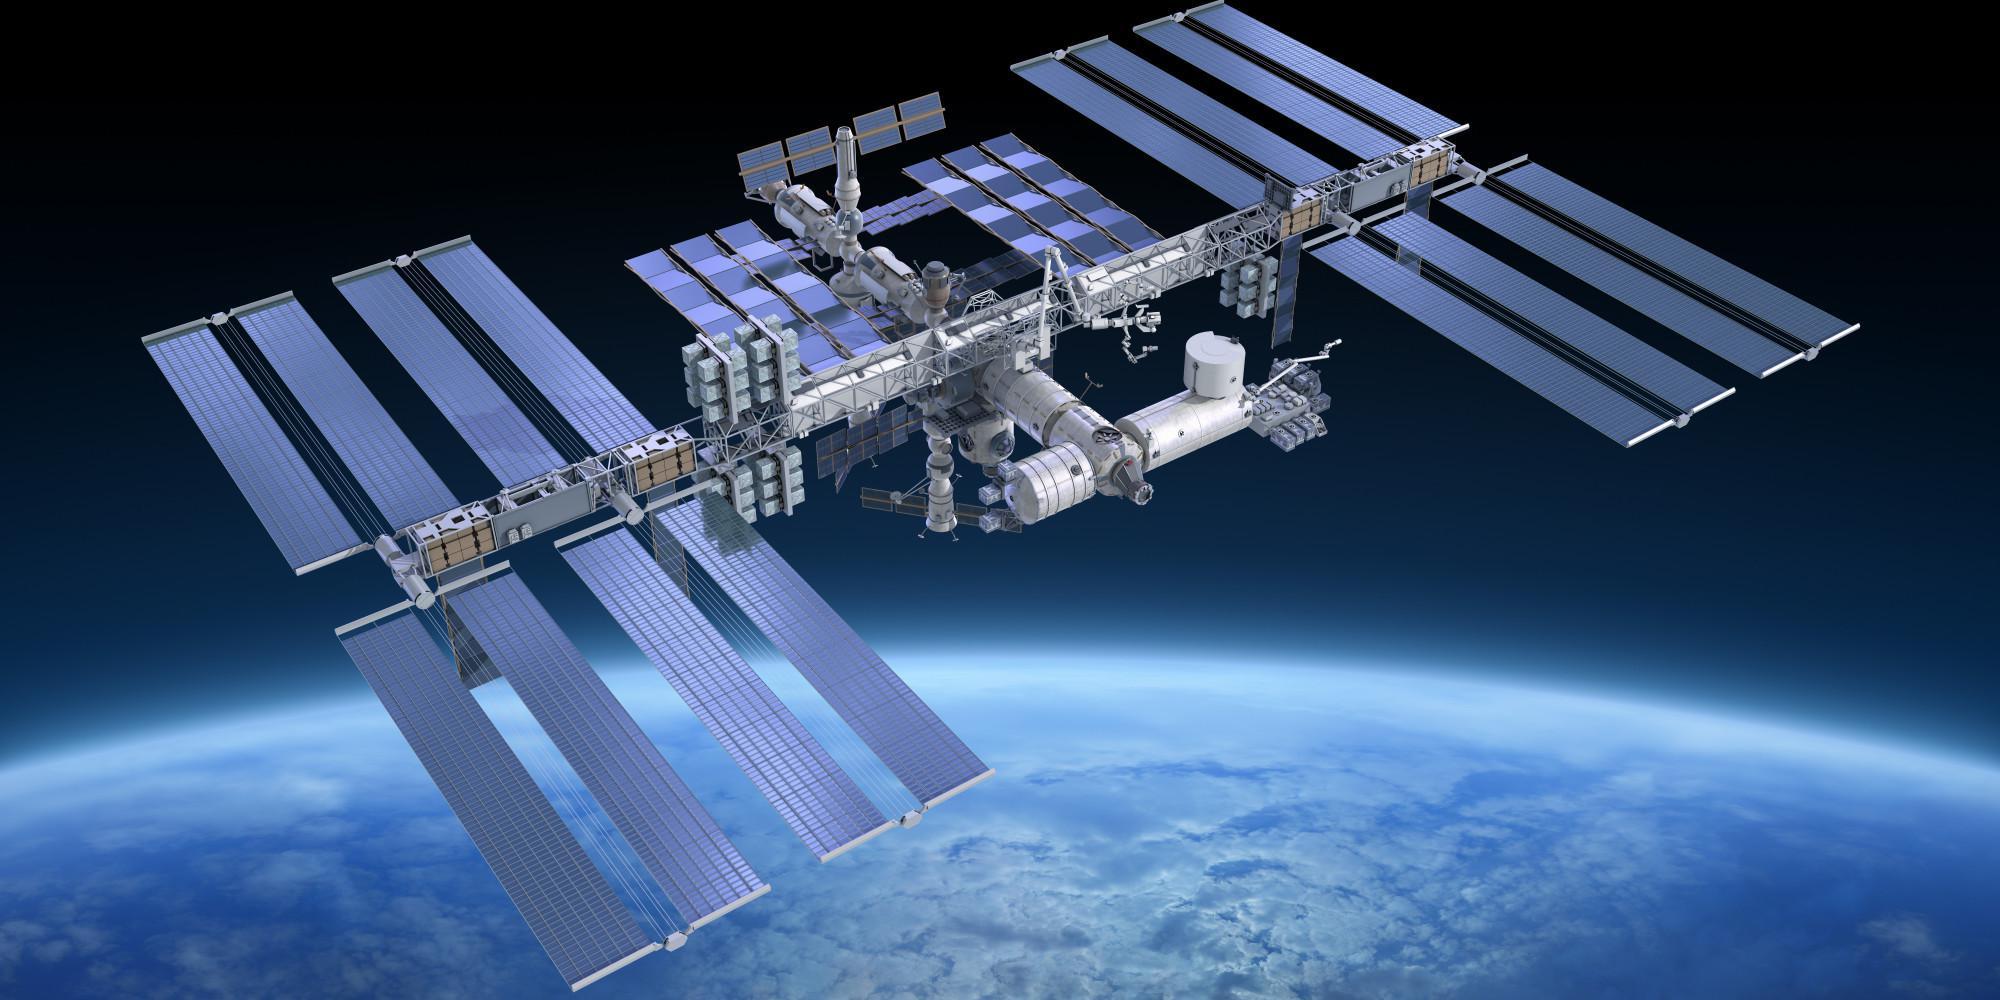 international space station nasa - HD2000×1000